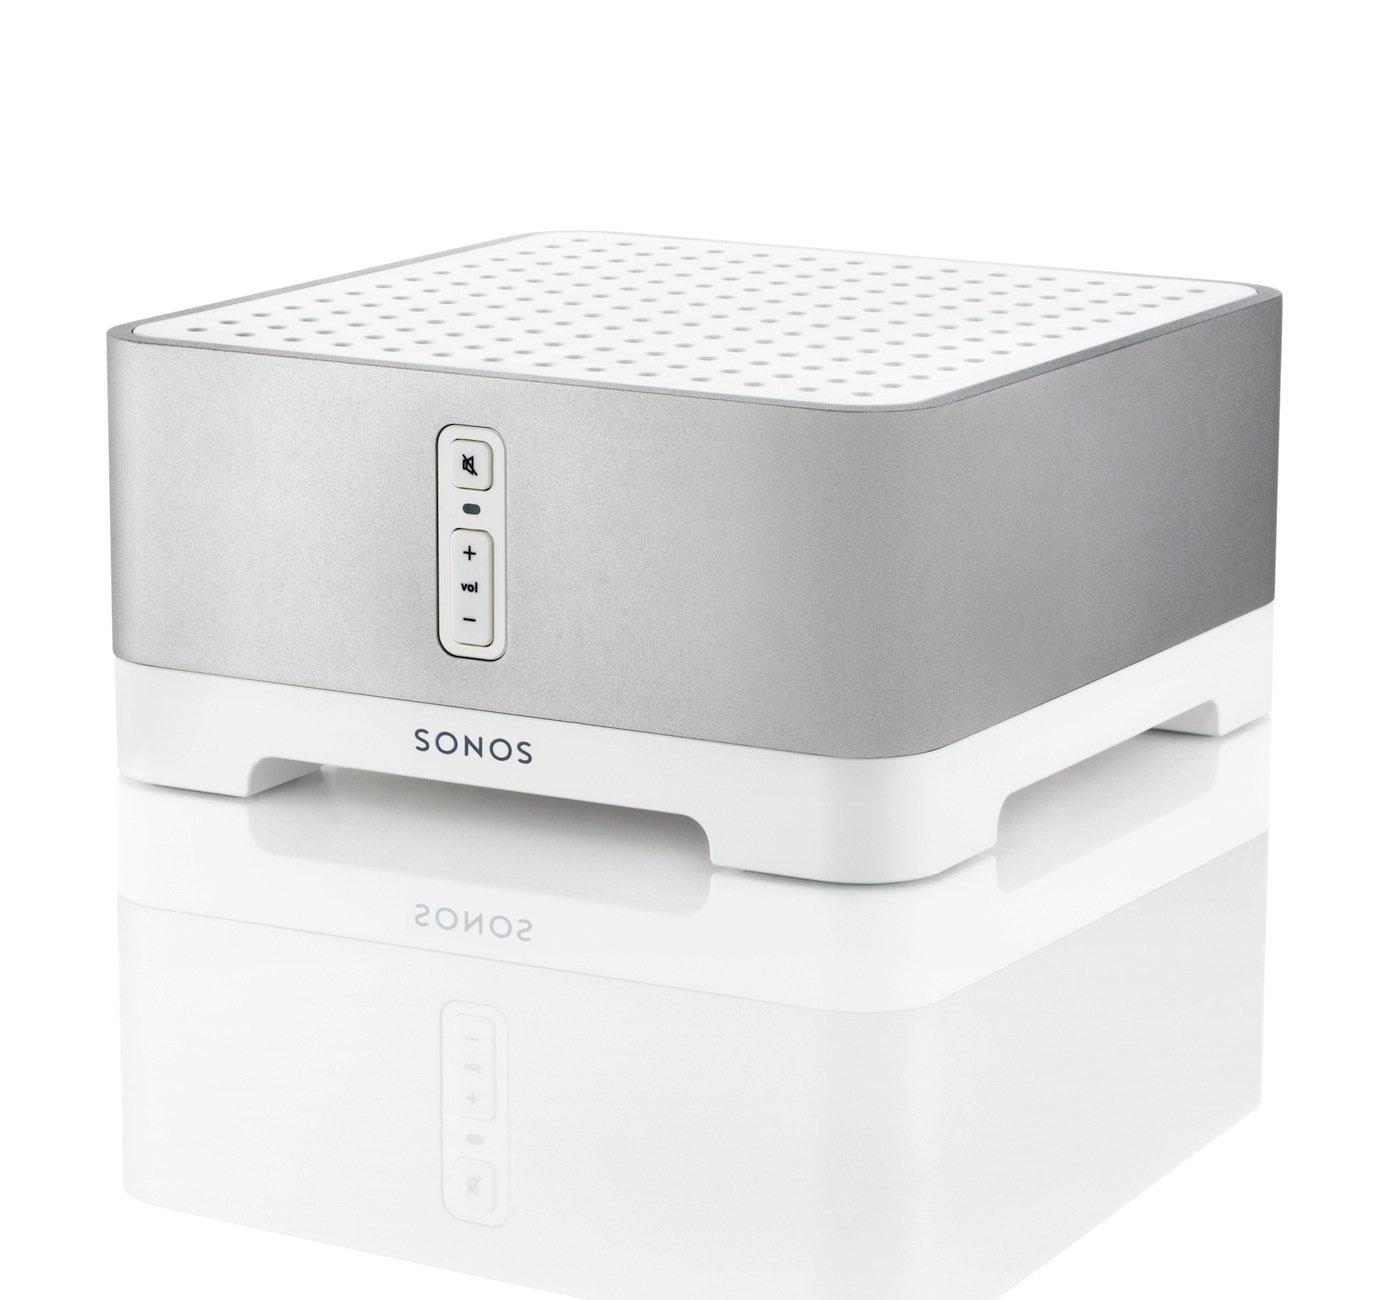 sonos connect amp wireless digital amplifier streaming music patio poolside 180501001017 ebay. Black Bedroom Furniture Sets. Home Design Ideas